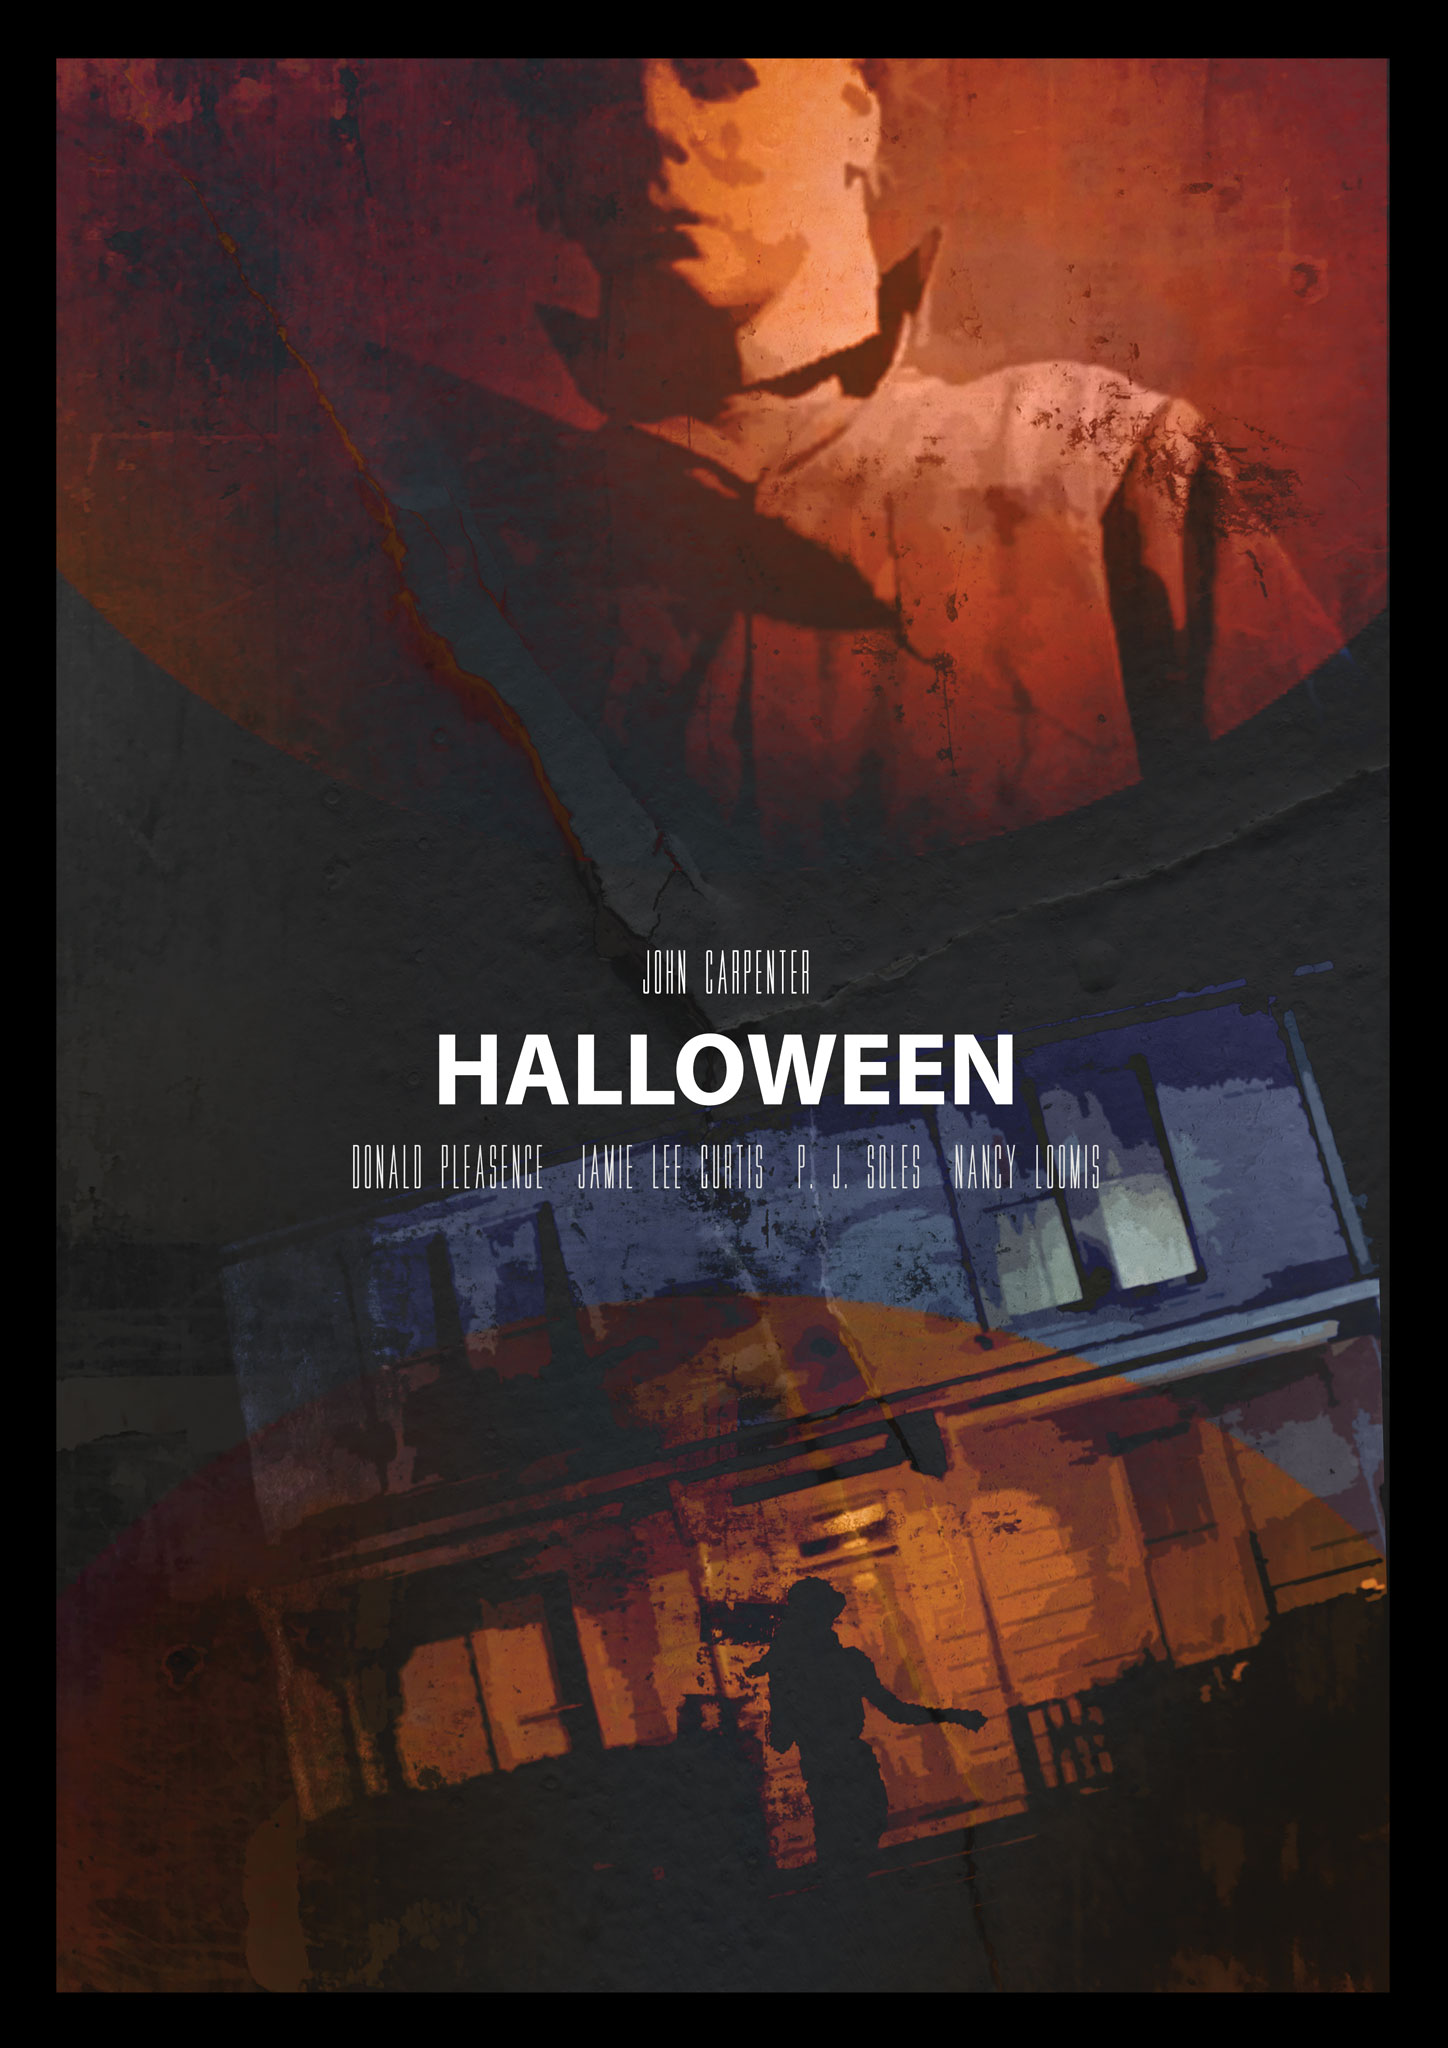 halloween movie poster 70s film